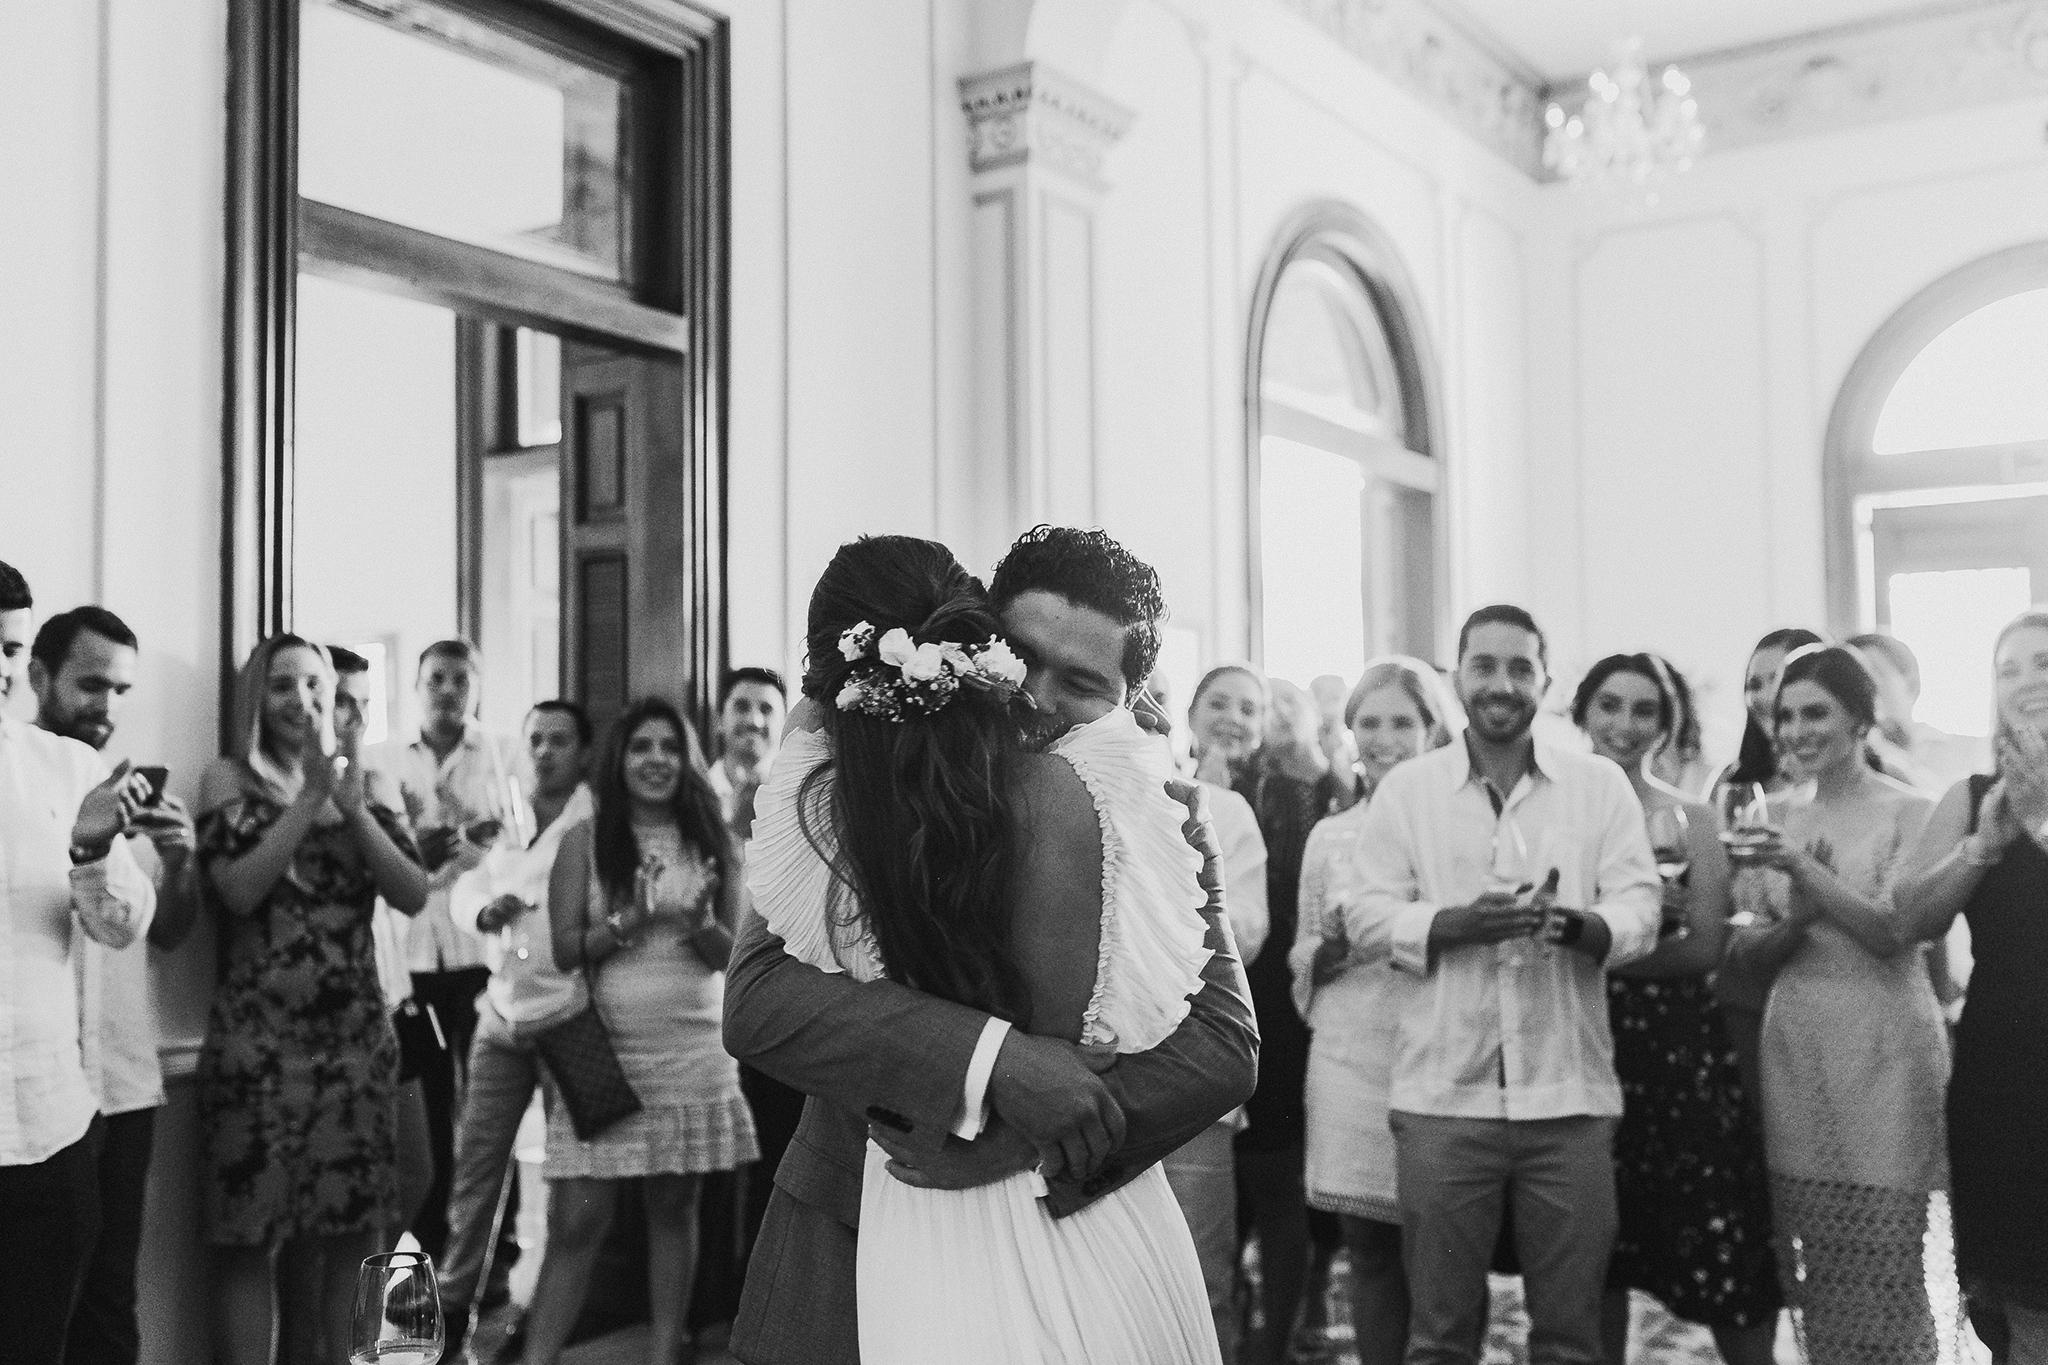 0127civil_Hacienda_WeddingDstination_MeridaYucatan_HaciendasMerida_BodasMexico_BodasYucatan_Boda_Destino.jpg